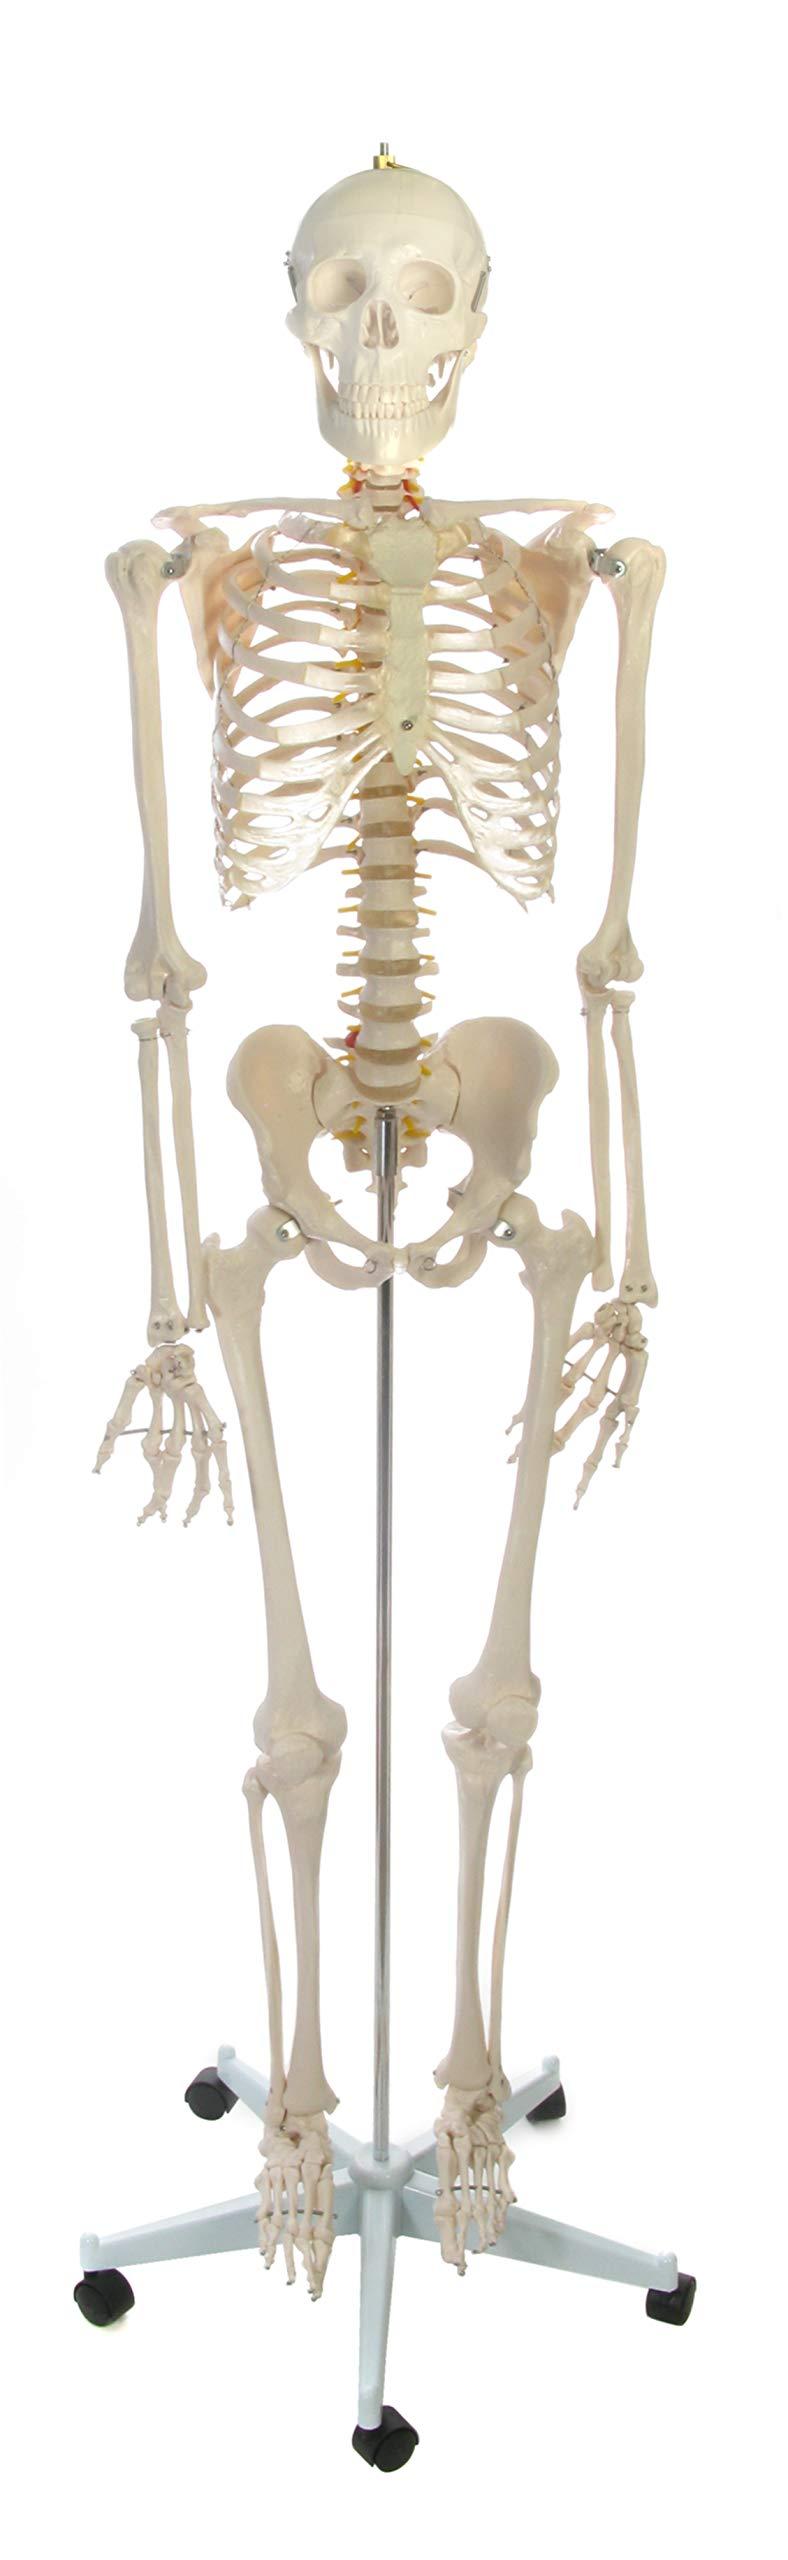 American Educational Rugged Plastic Life Sized Skeleton Model, 67'' Height